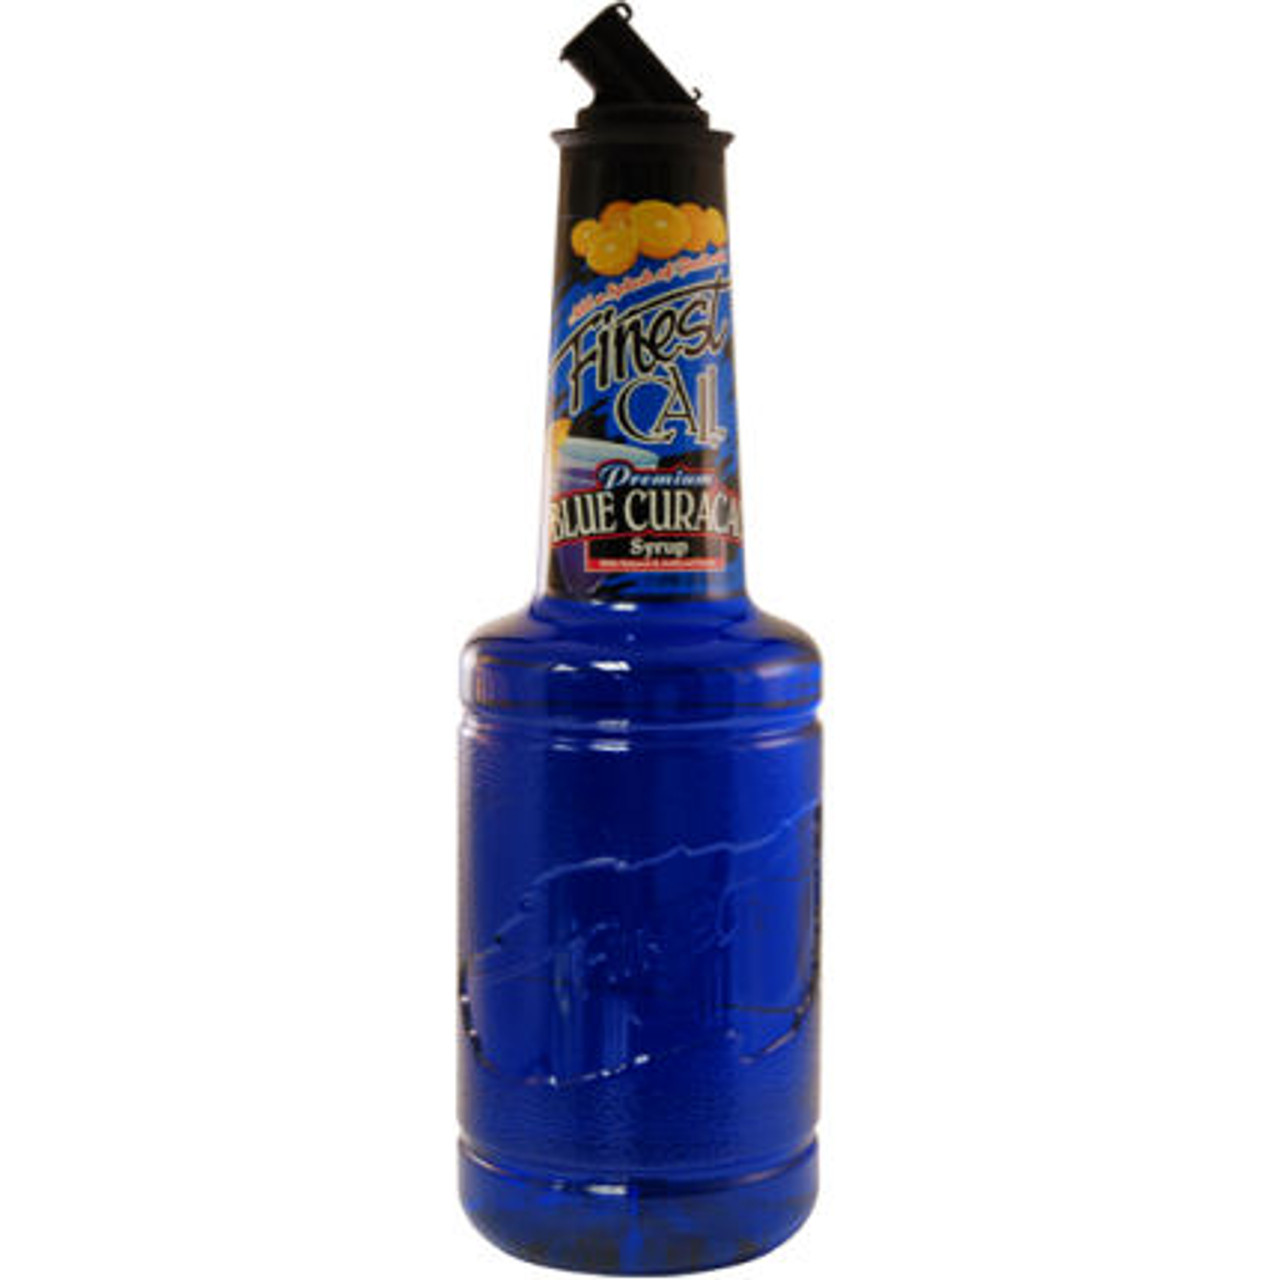 Finest Call Blue Curacao 1L - FineWineHouse